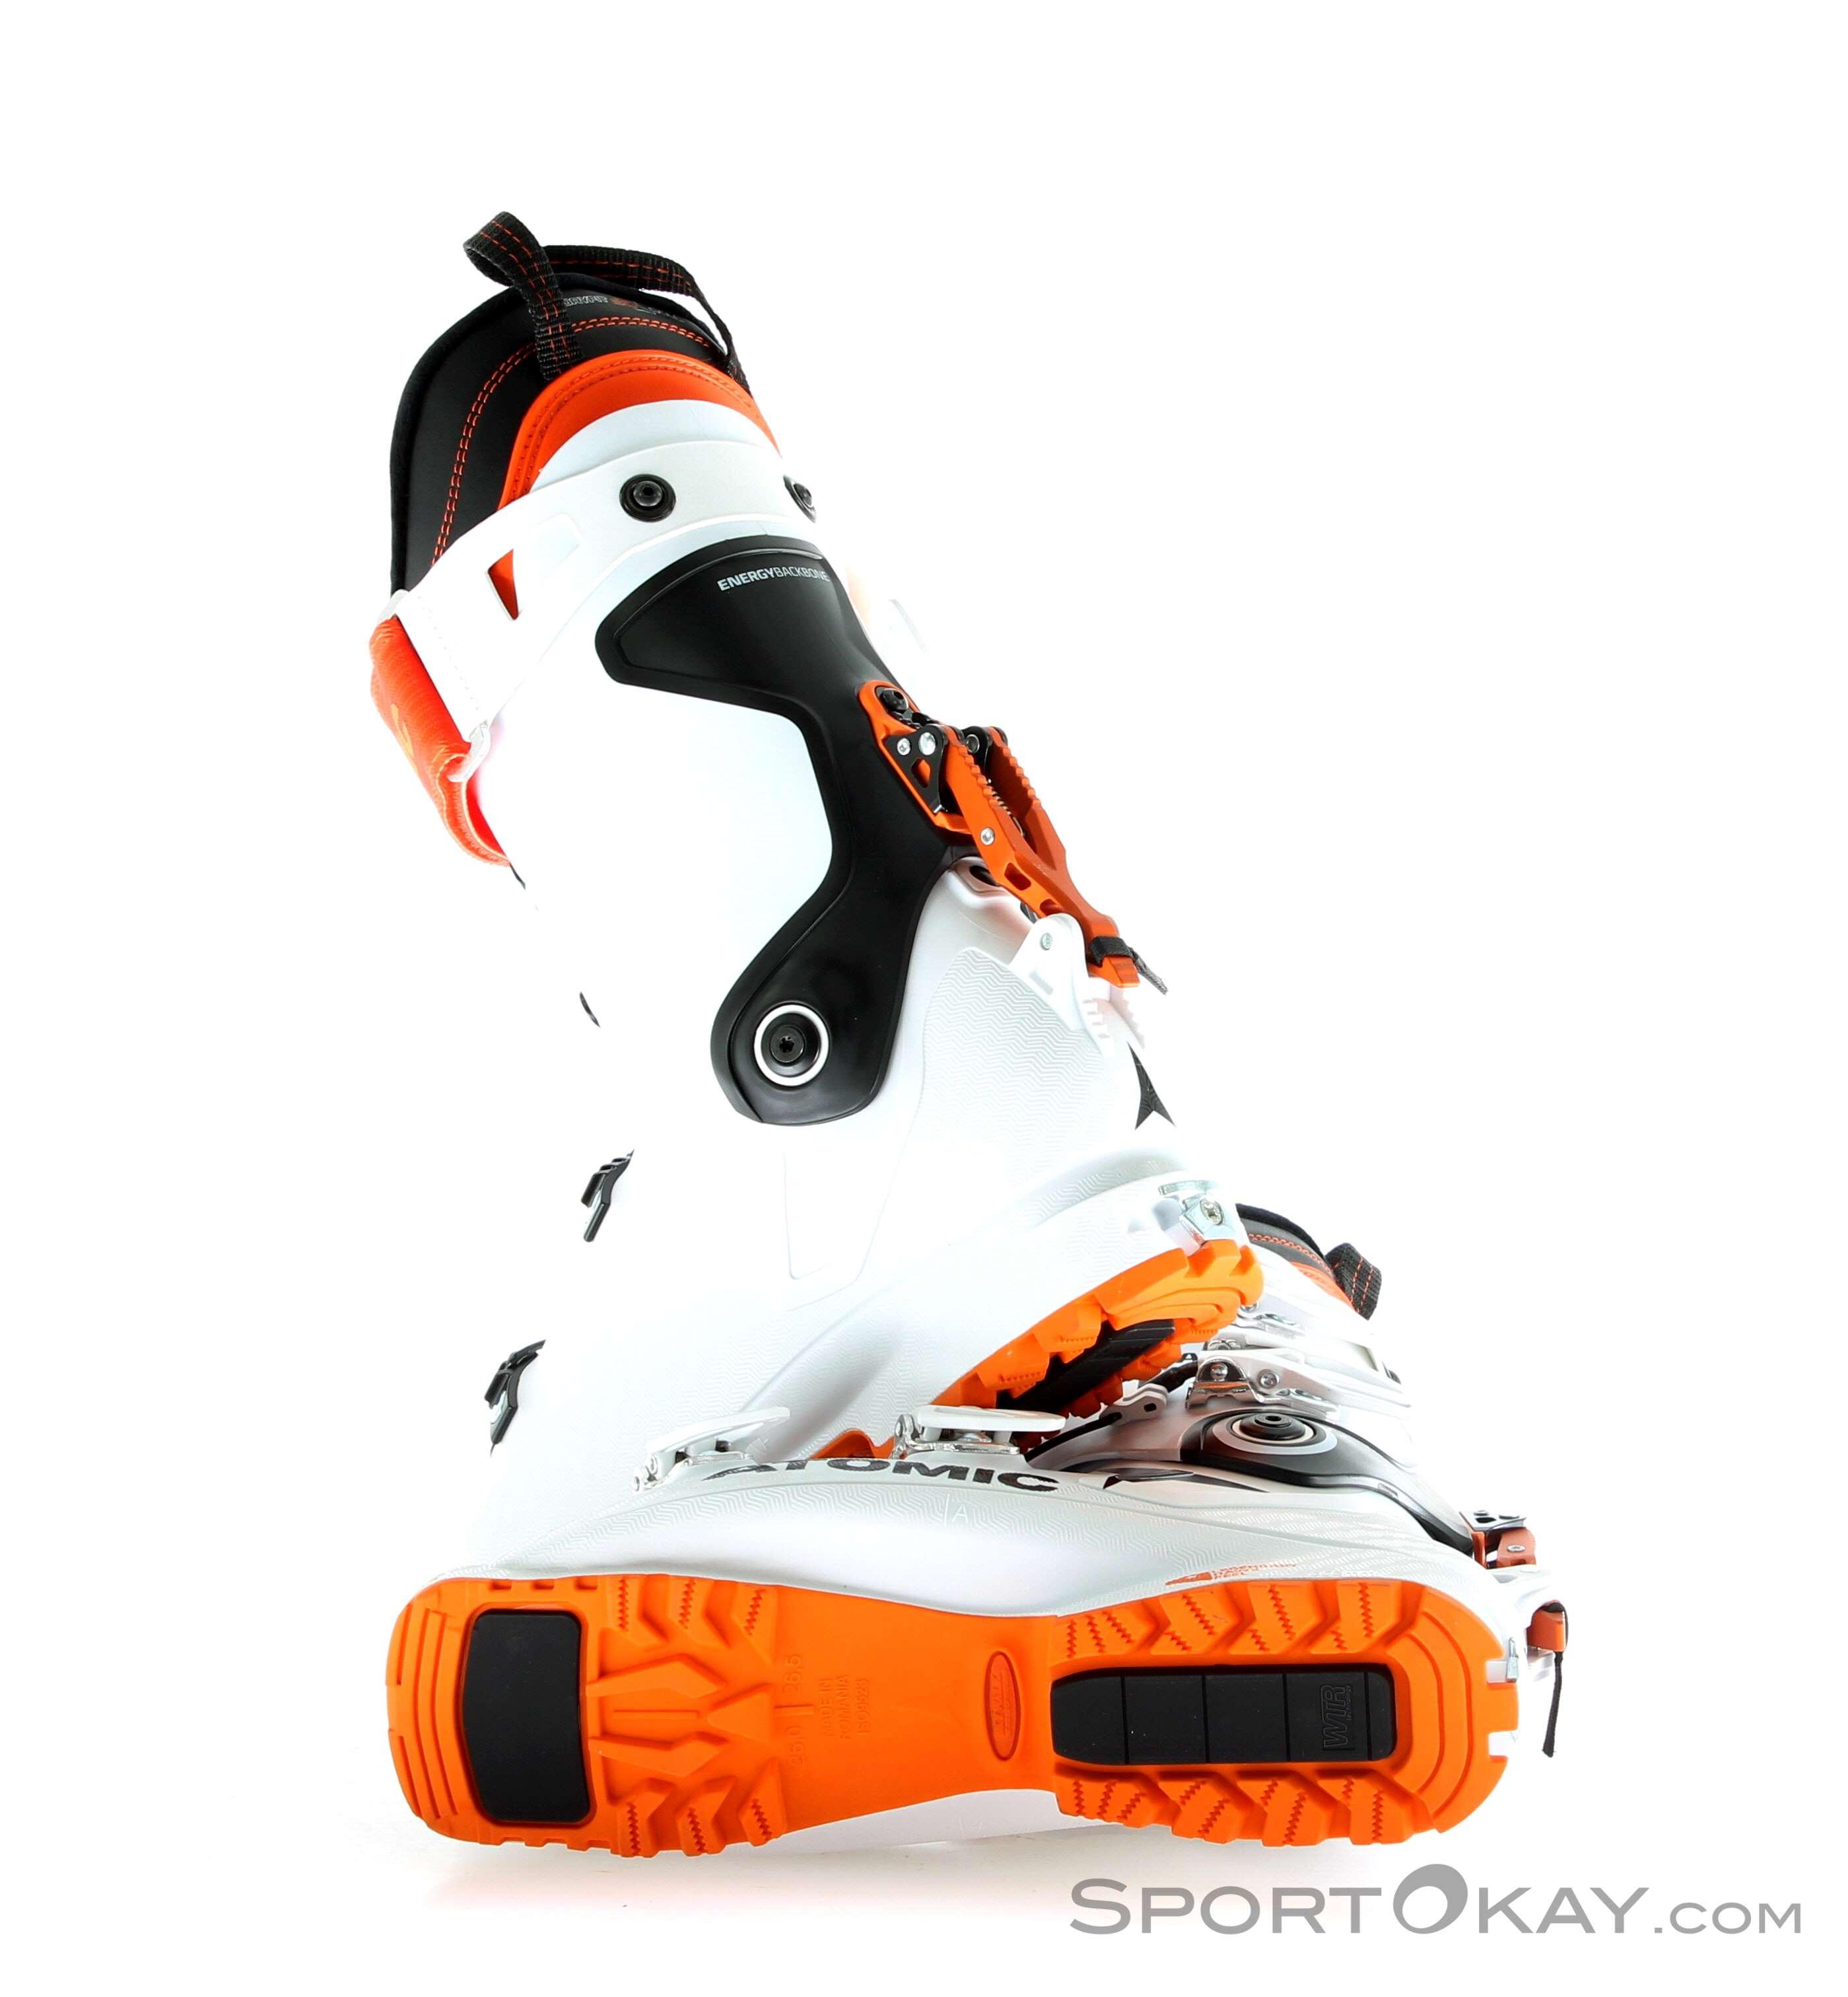 buy online 44c8e aadb5 Atomic Hawx Ultra Xtd 100 Ski Boots 2018 ✓ The Skiing